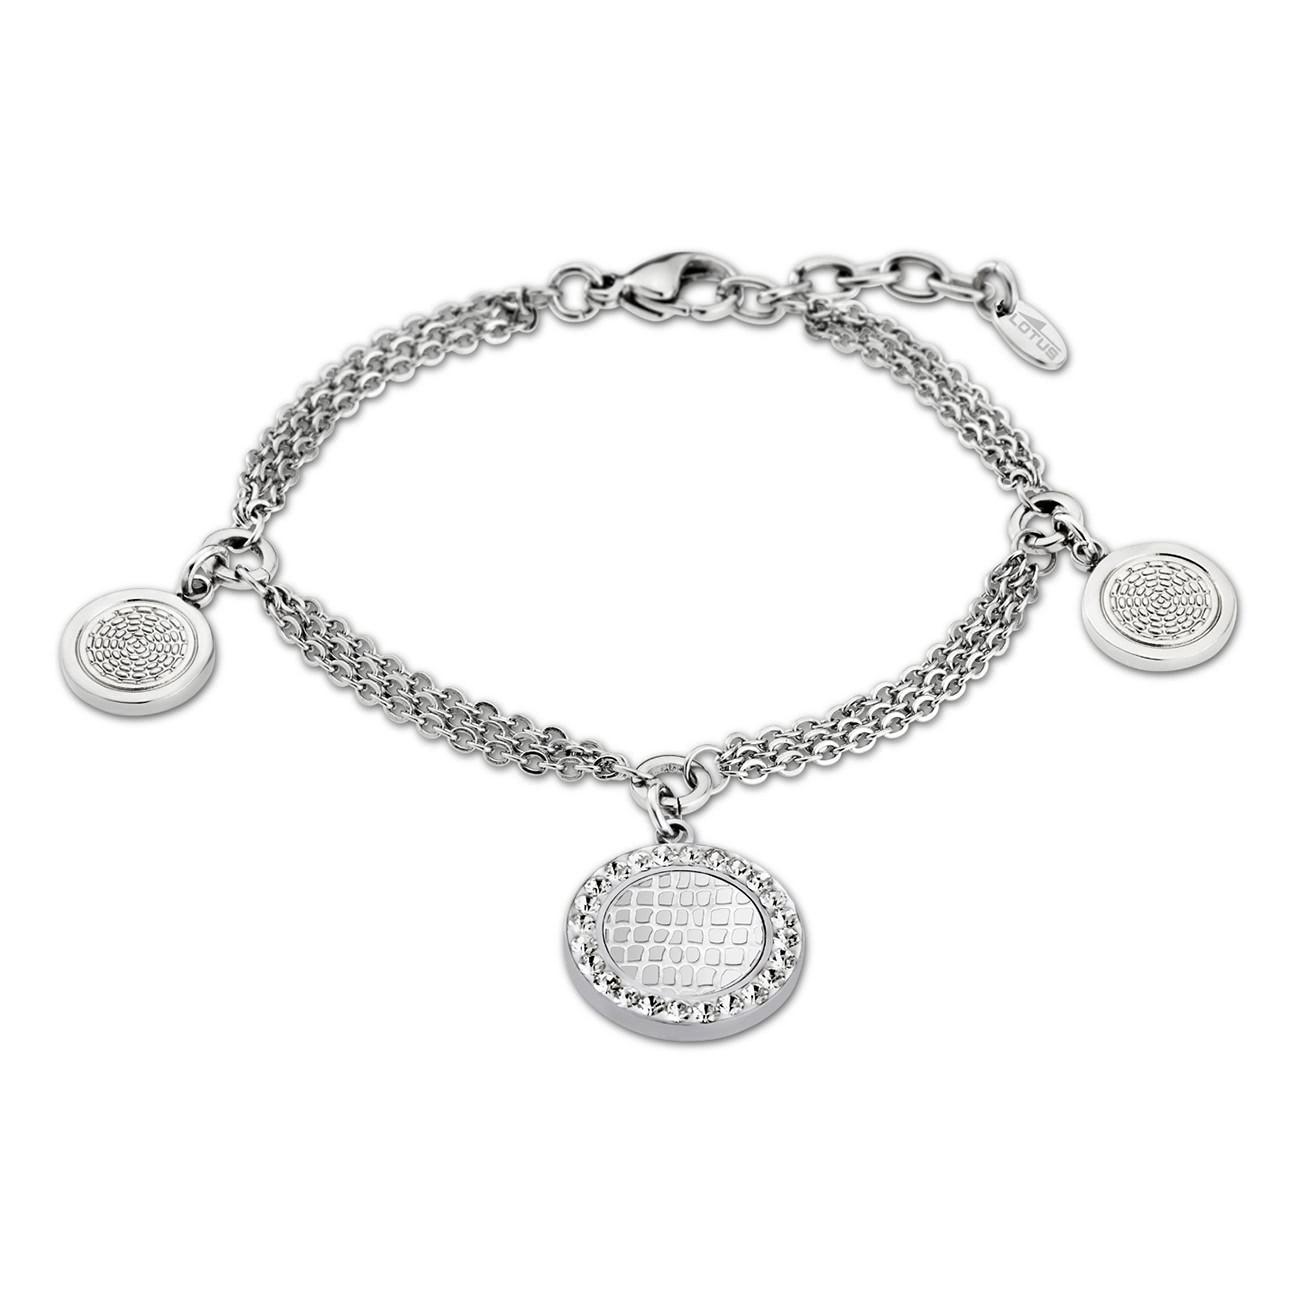 LOTUS Style Armband Damen Edelstahl silber LS1778-2/1 Privilege JLS1778-2-1